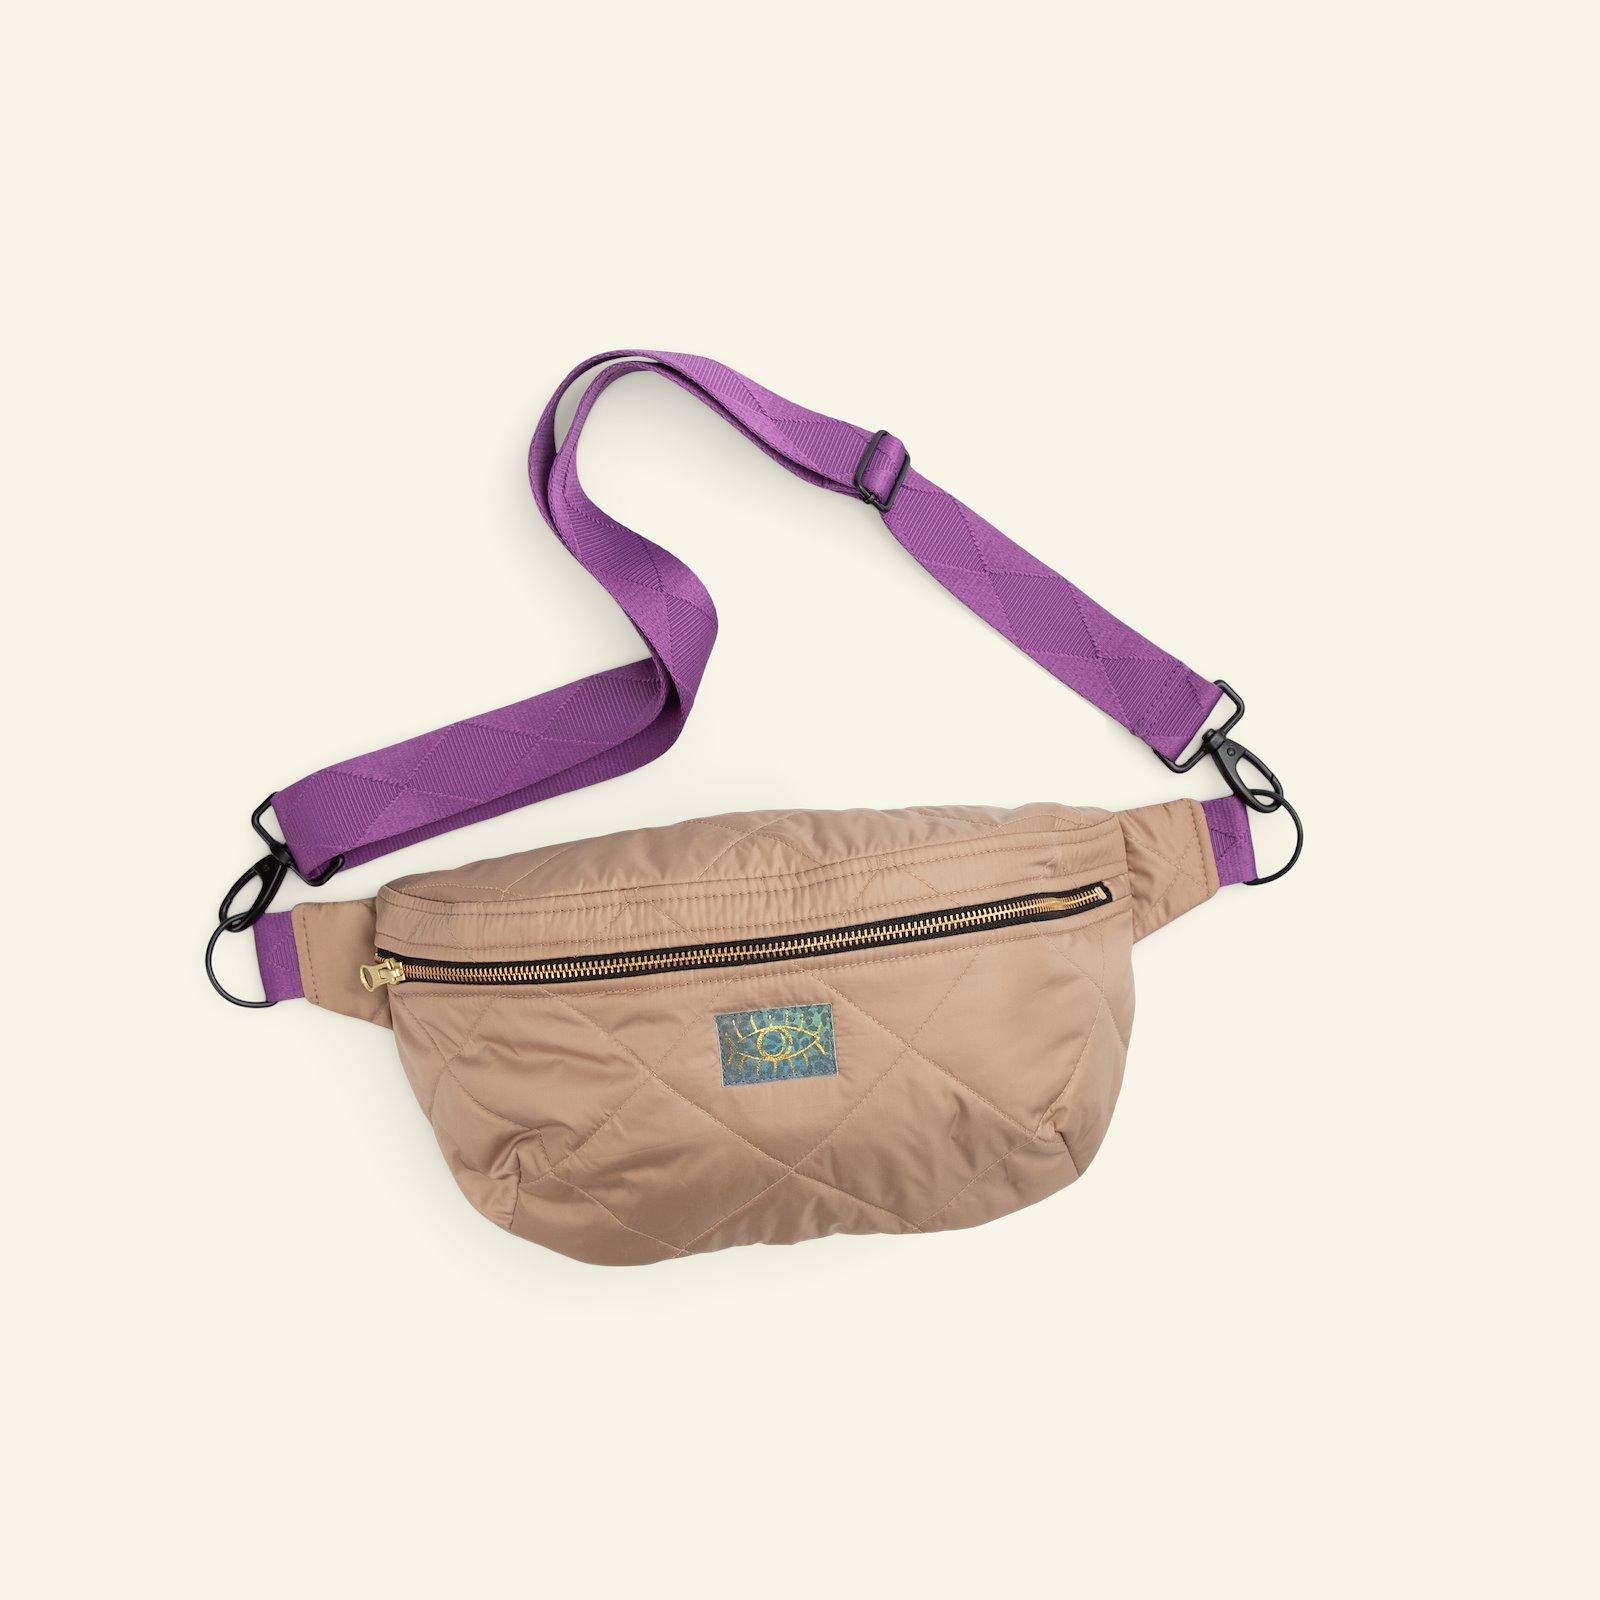 Ribbon woven squares 38mm purple 2m p90330_920233_22293_24817_z59373_sskit